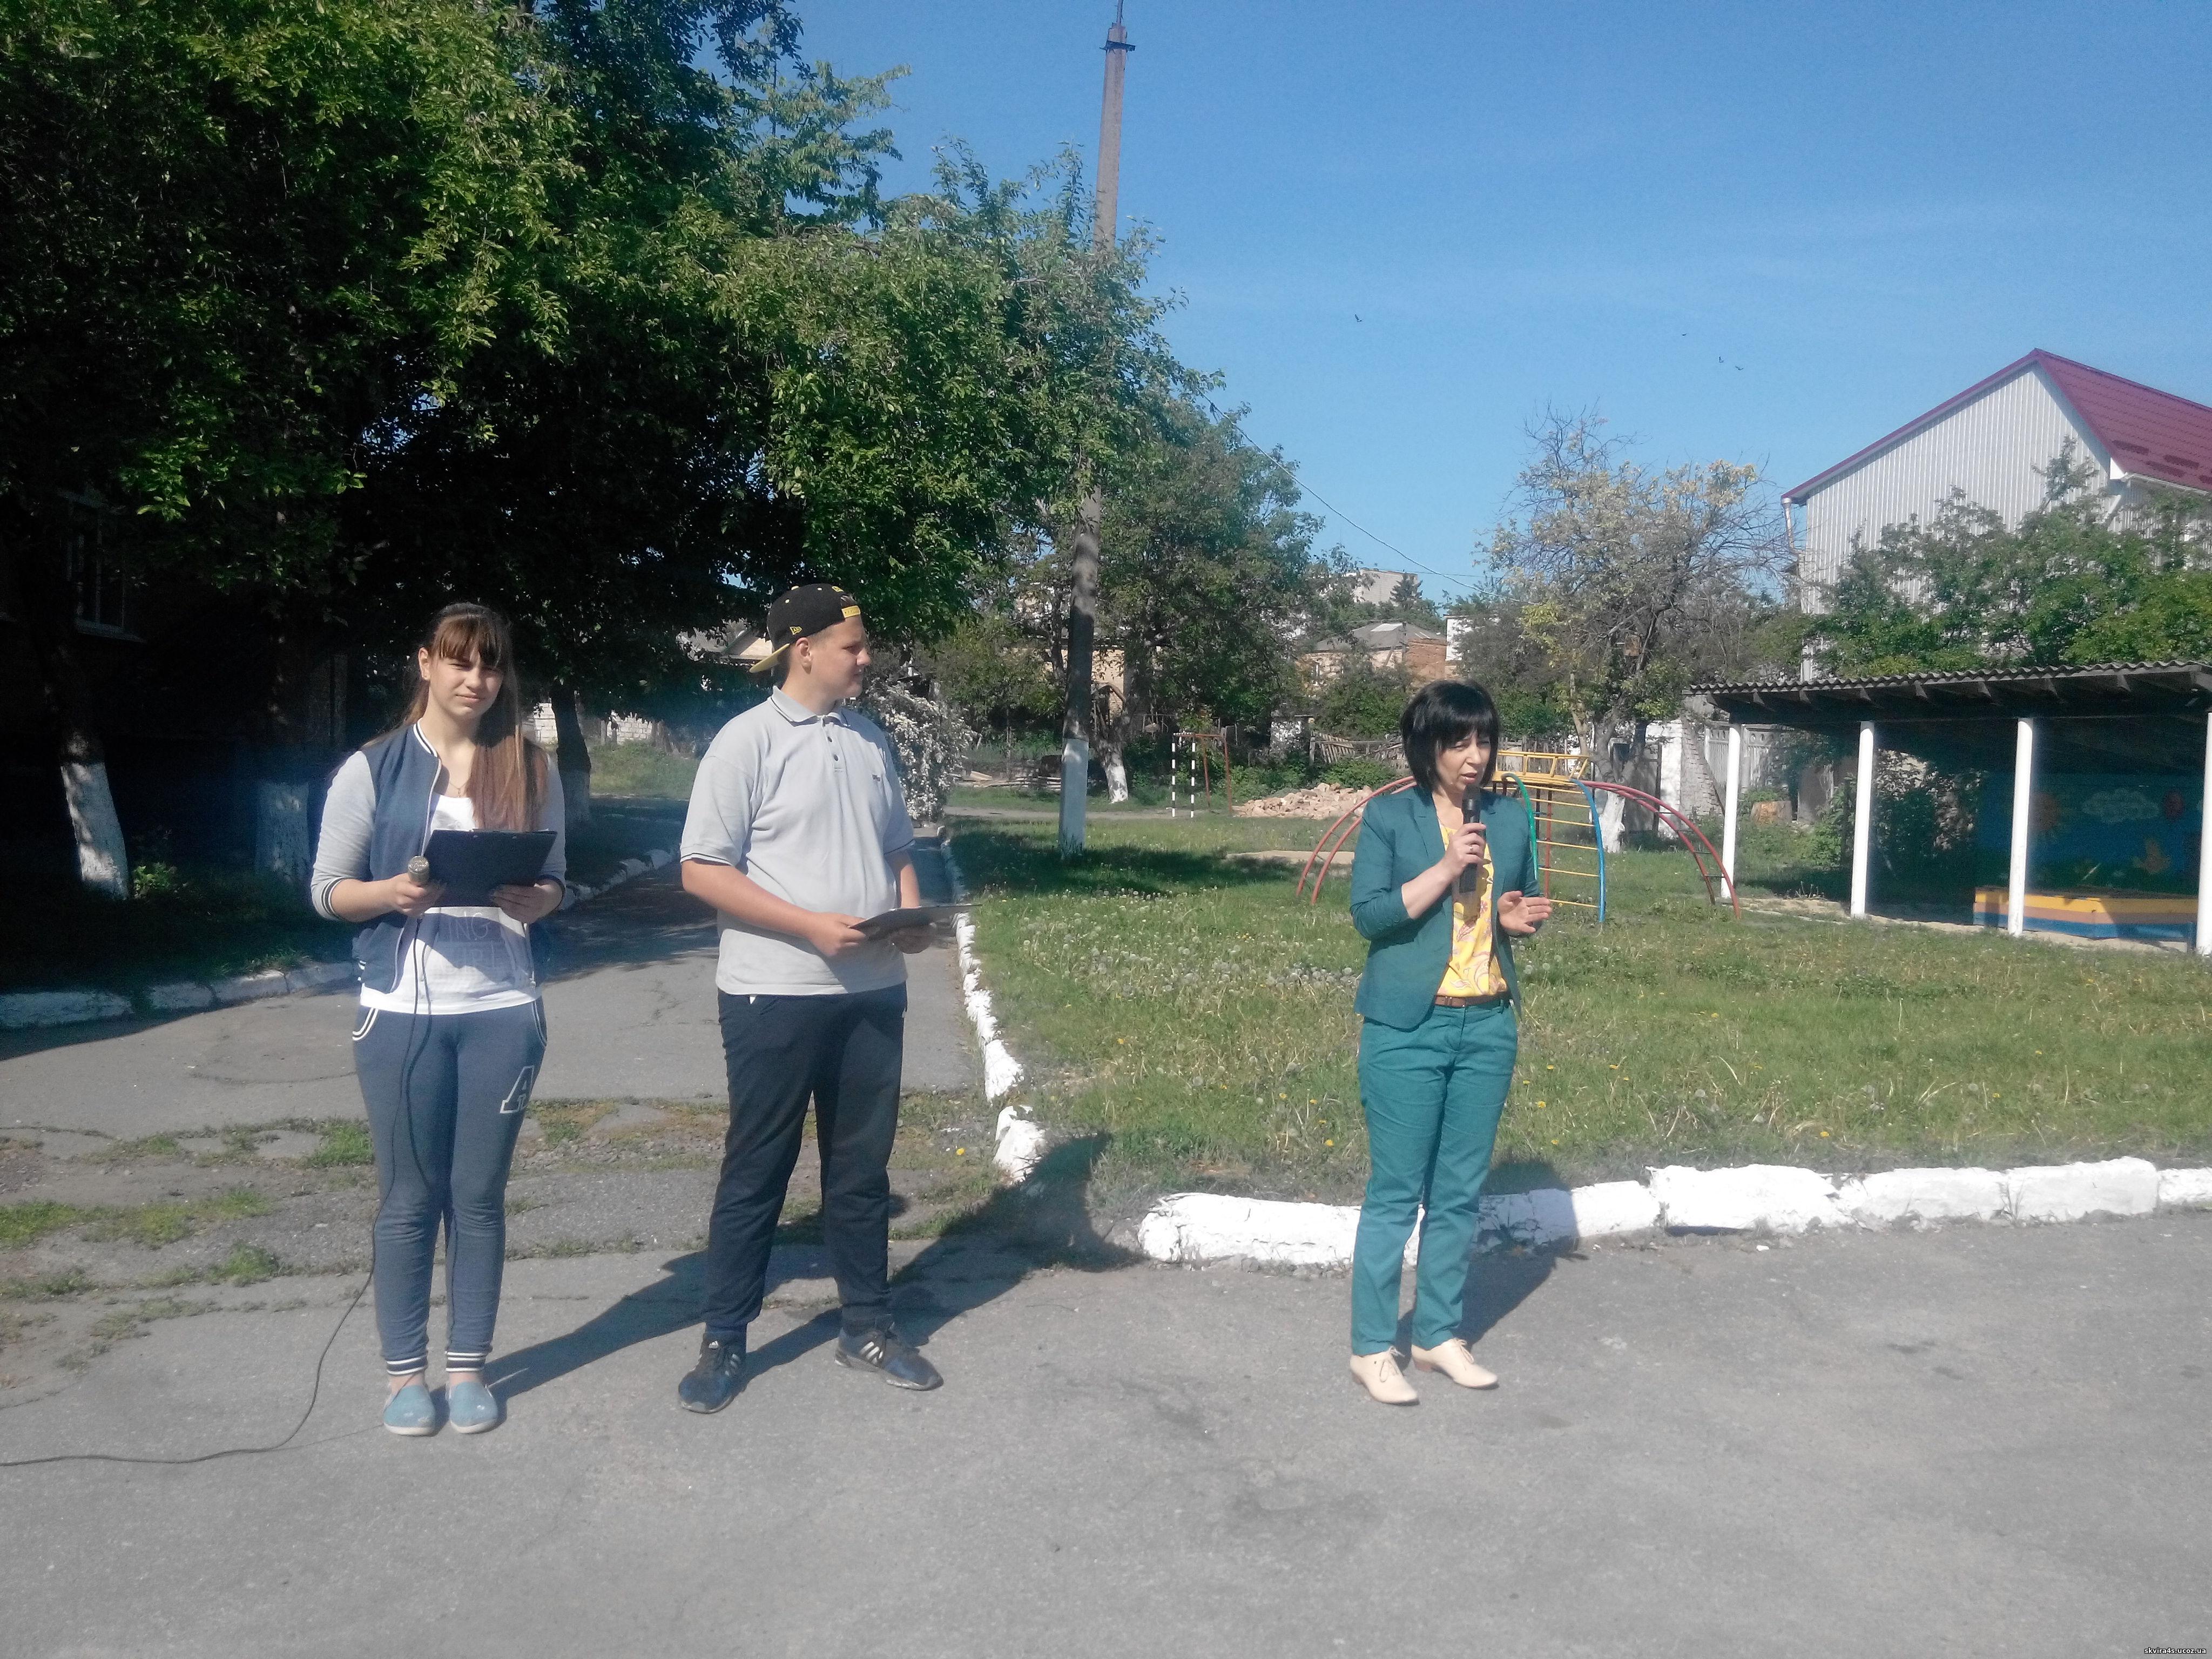 http://skvira4s.ucoz.ua/foto/24-05-17-1/2017524091531.jpg